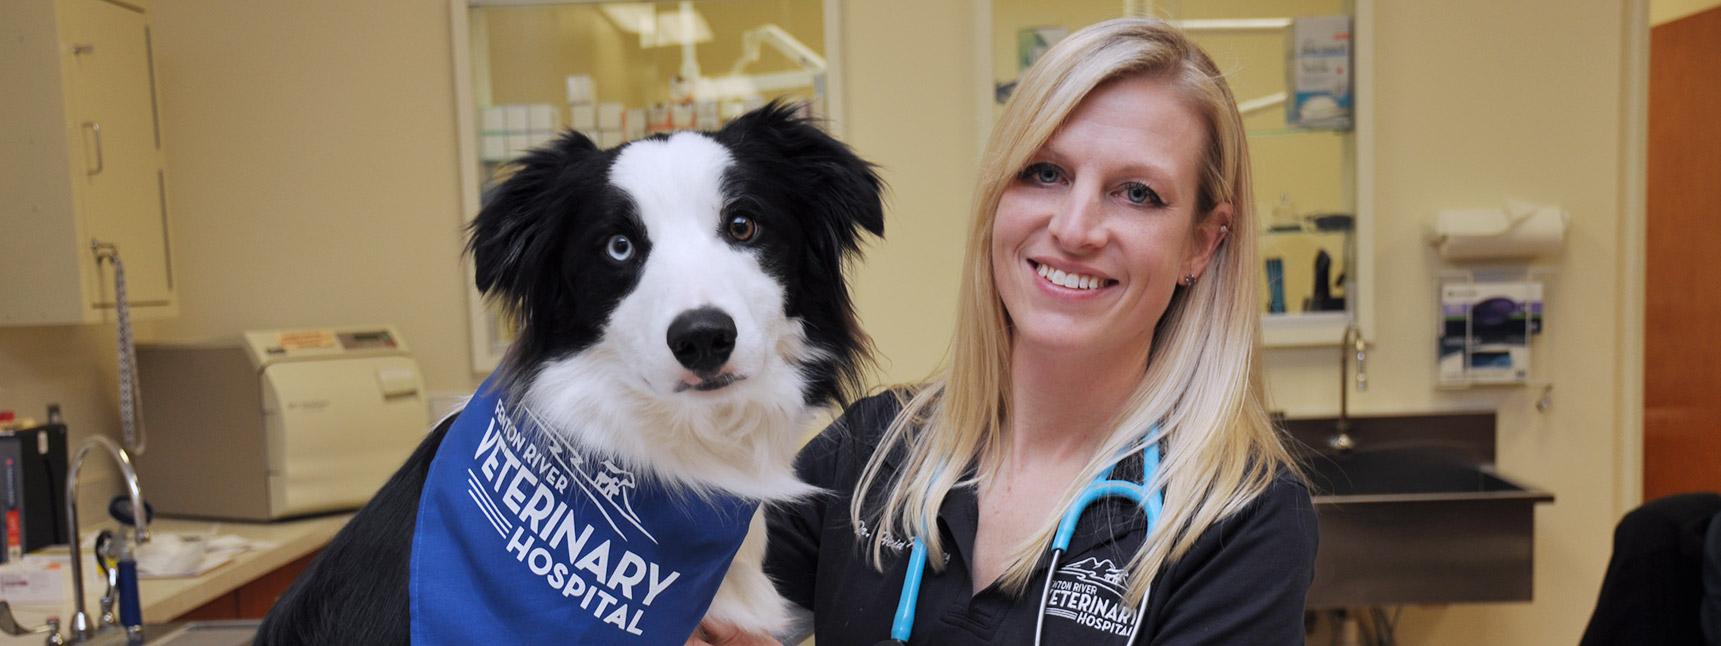 Small Animal Care at Fenton River Veterinary Hospital